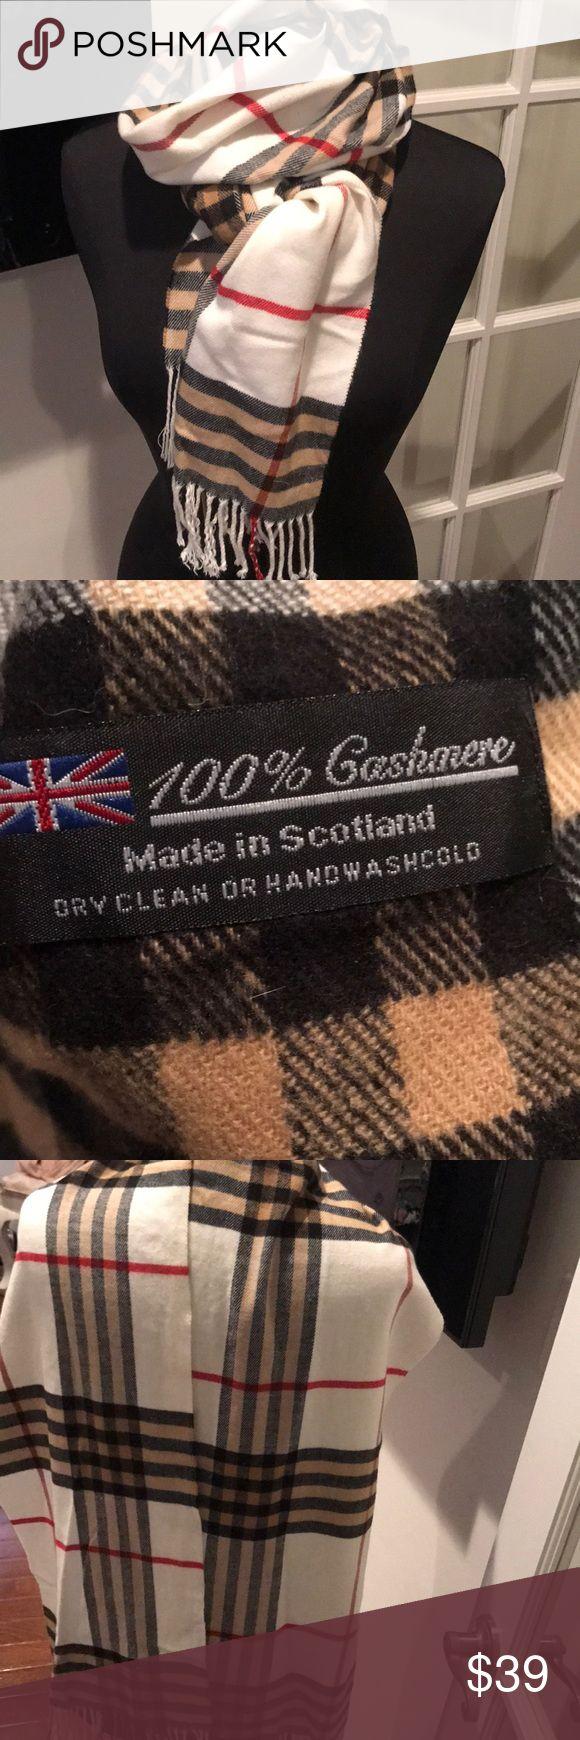 Unisex cashmere white/blk/tan/red stripe scarf Cashmere white/black/red/tan stripe Scottish/English design scarf no name Accessories Scarves & Wraps